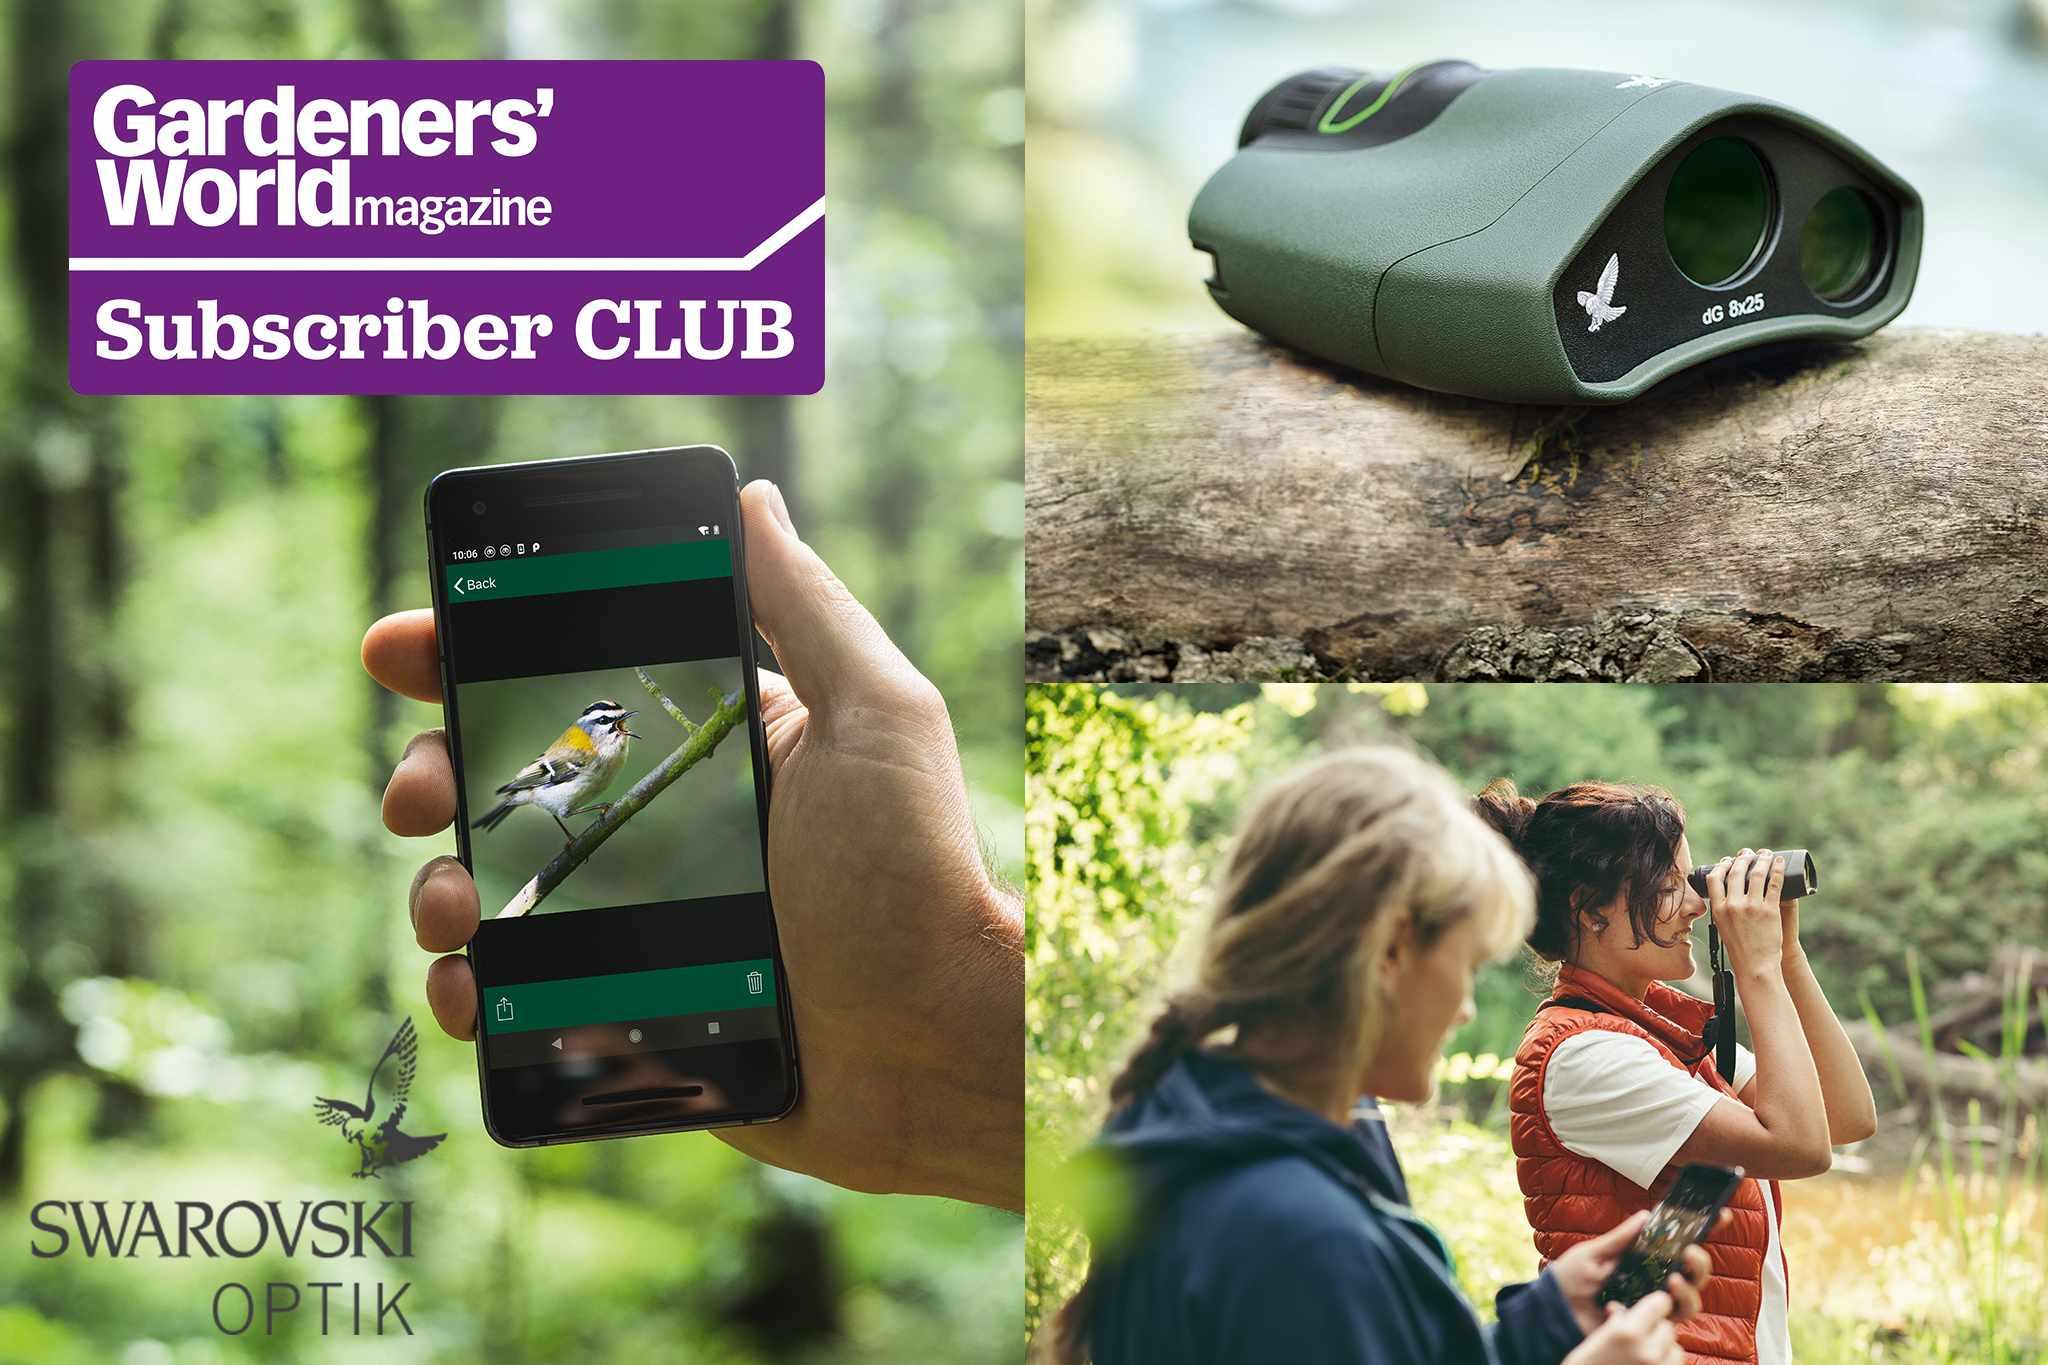 Subscriber Club: Win a Swarovski monocular, worth £1,650